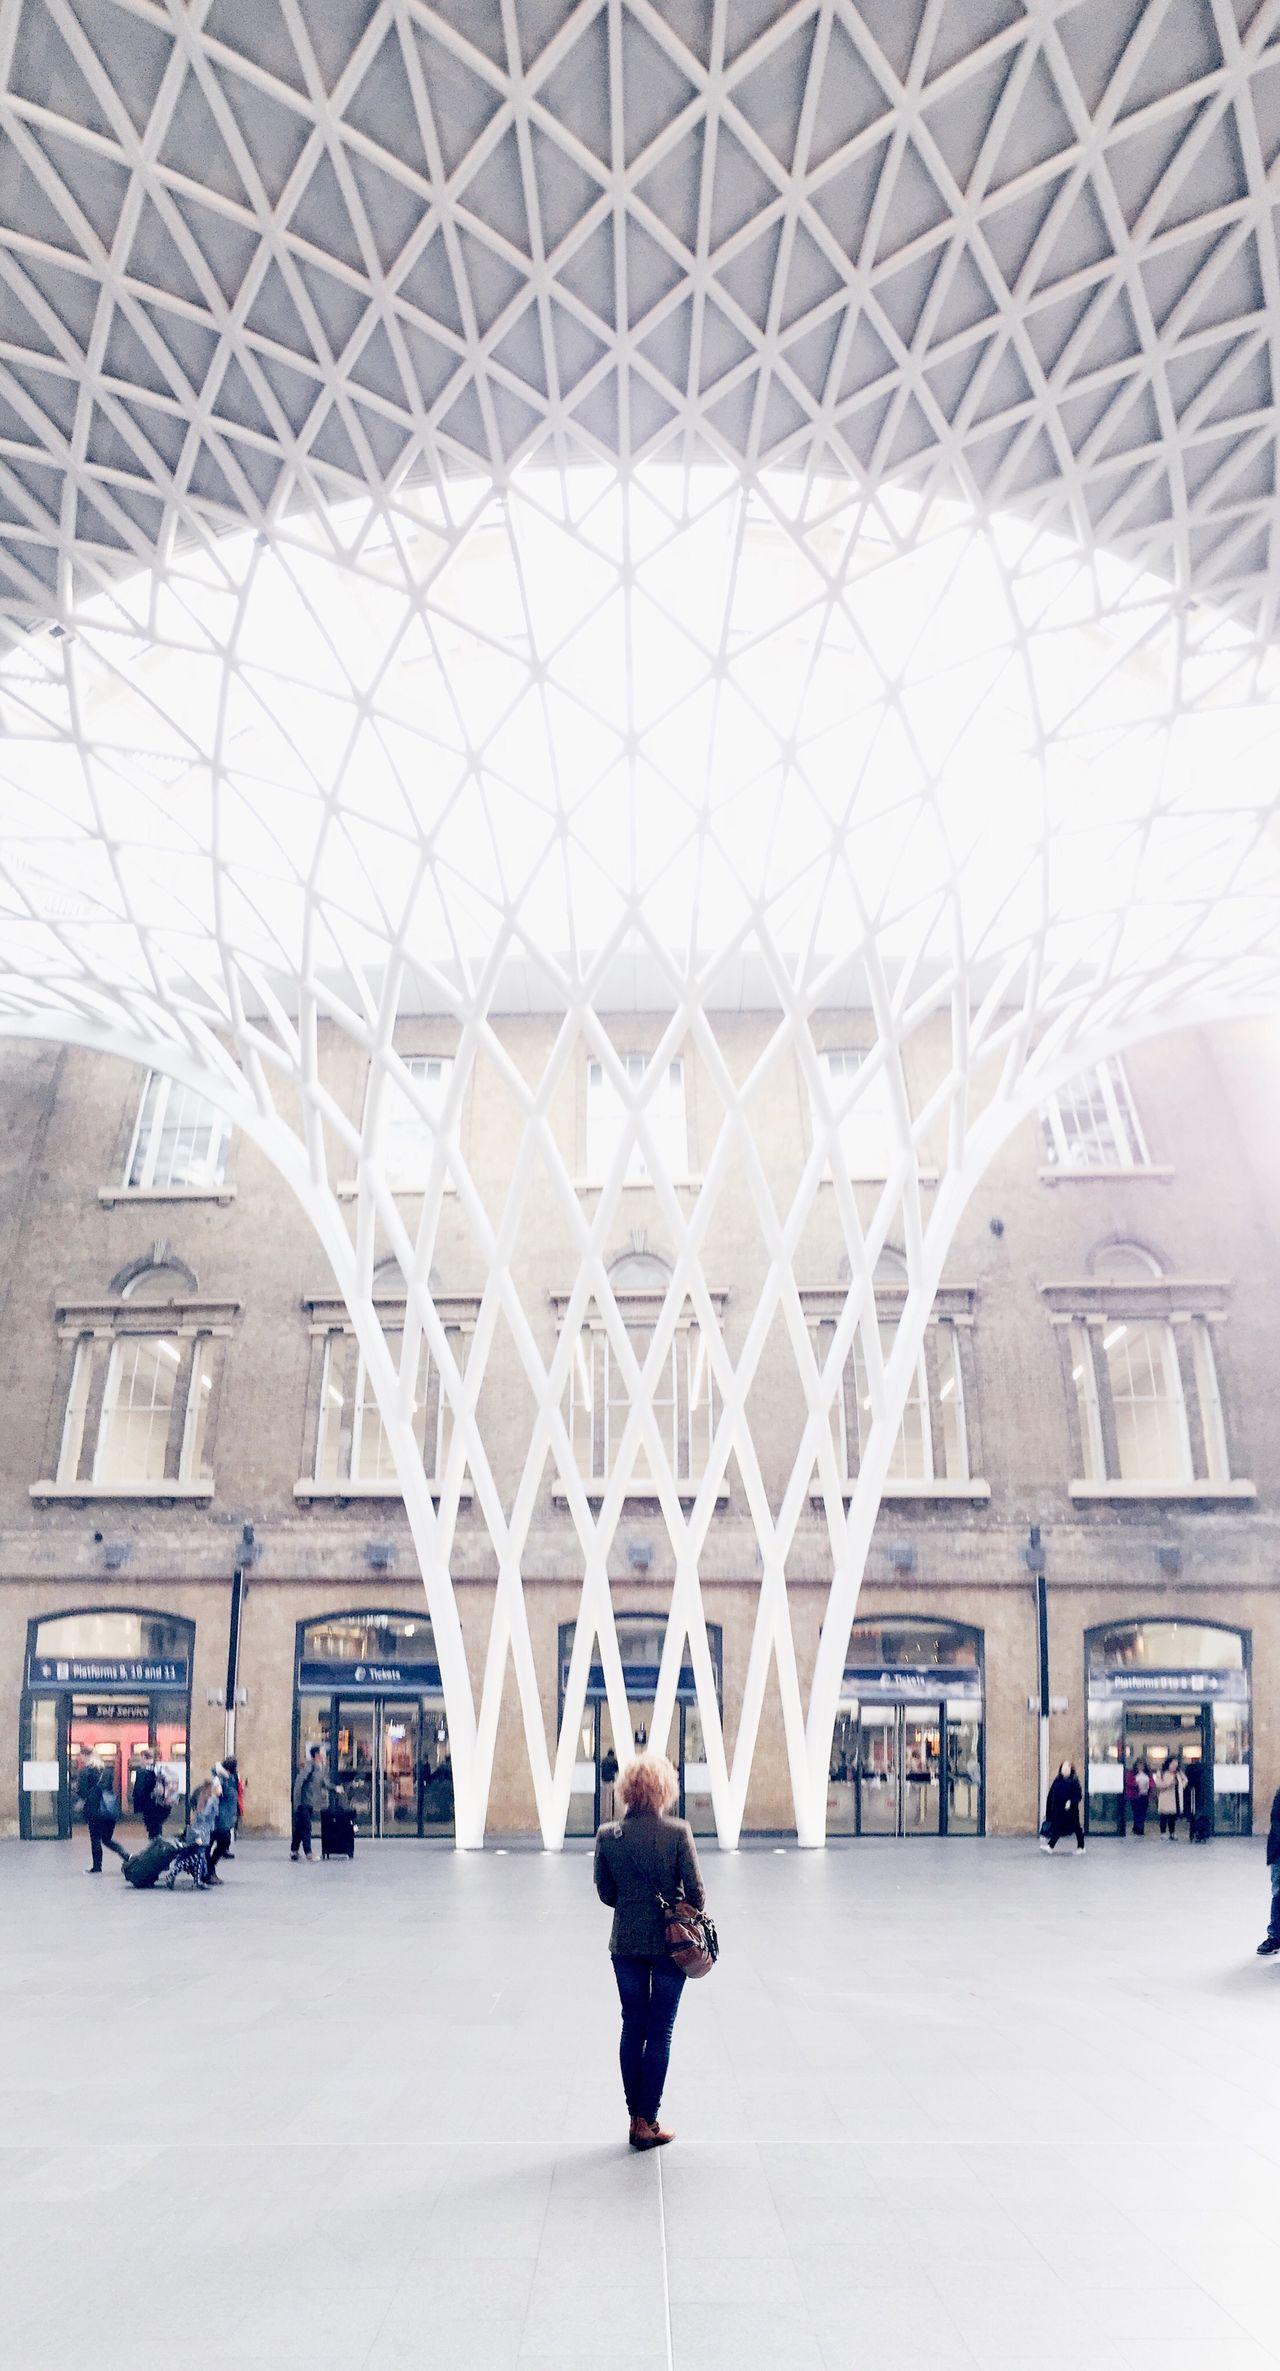 Beautiful stock photos of kreuz, built structure, indoors, architecture, city